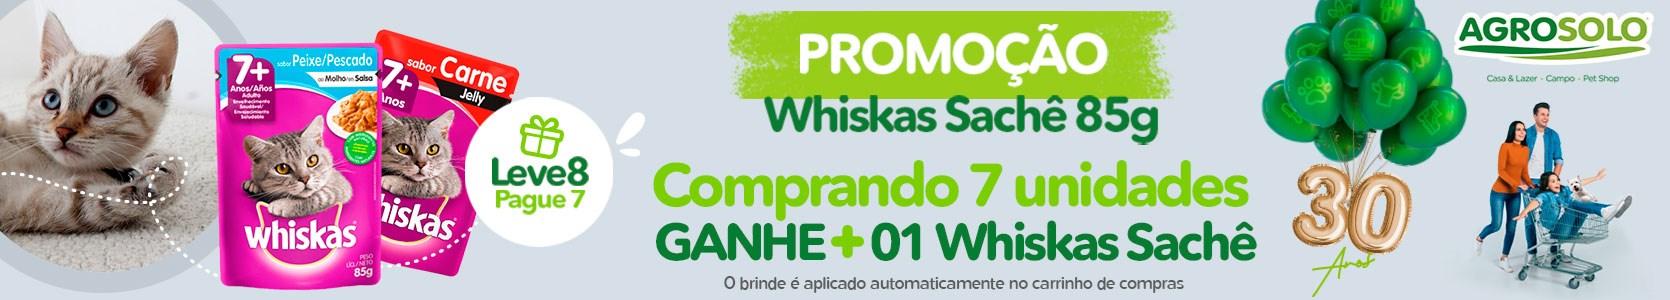 Banner Categoria Whiskas Desktop